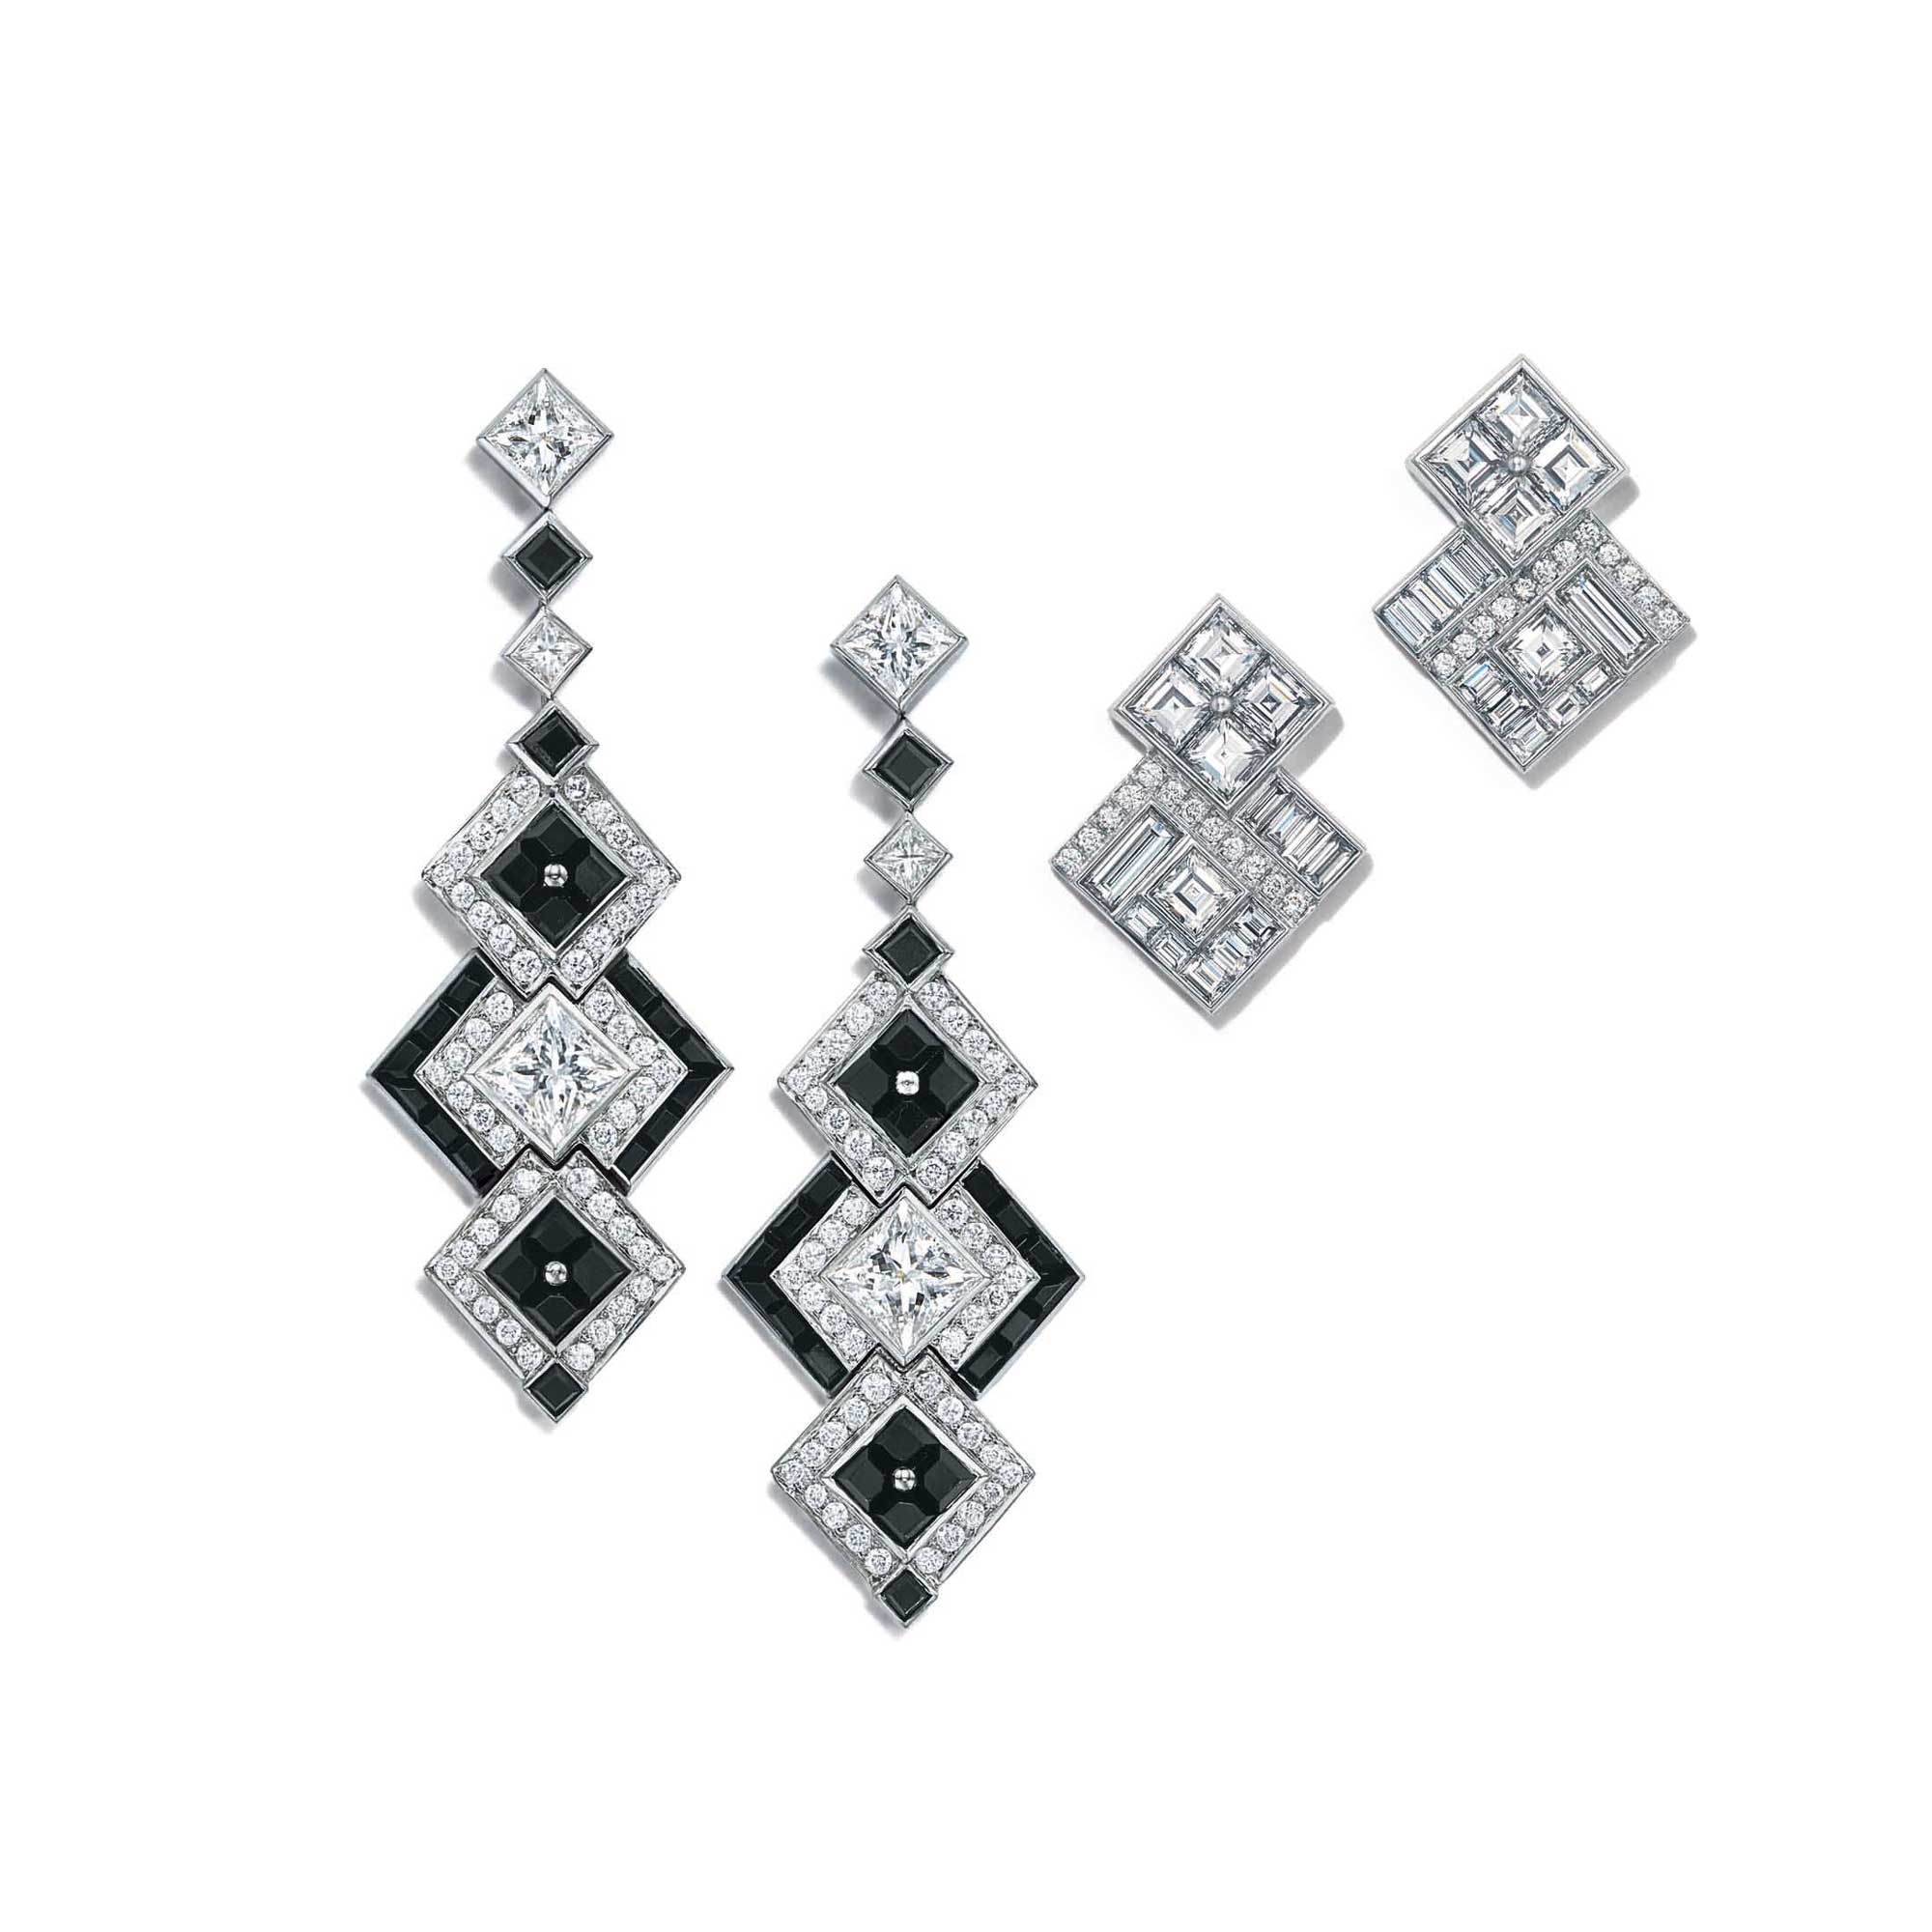 Tiffany Masterpieces onyx and diamond earrings